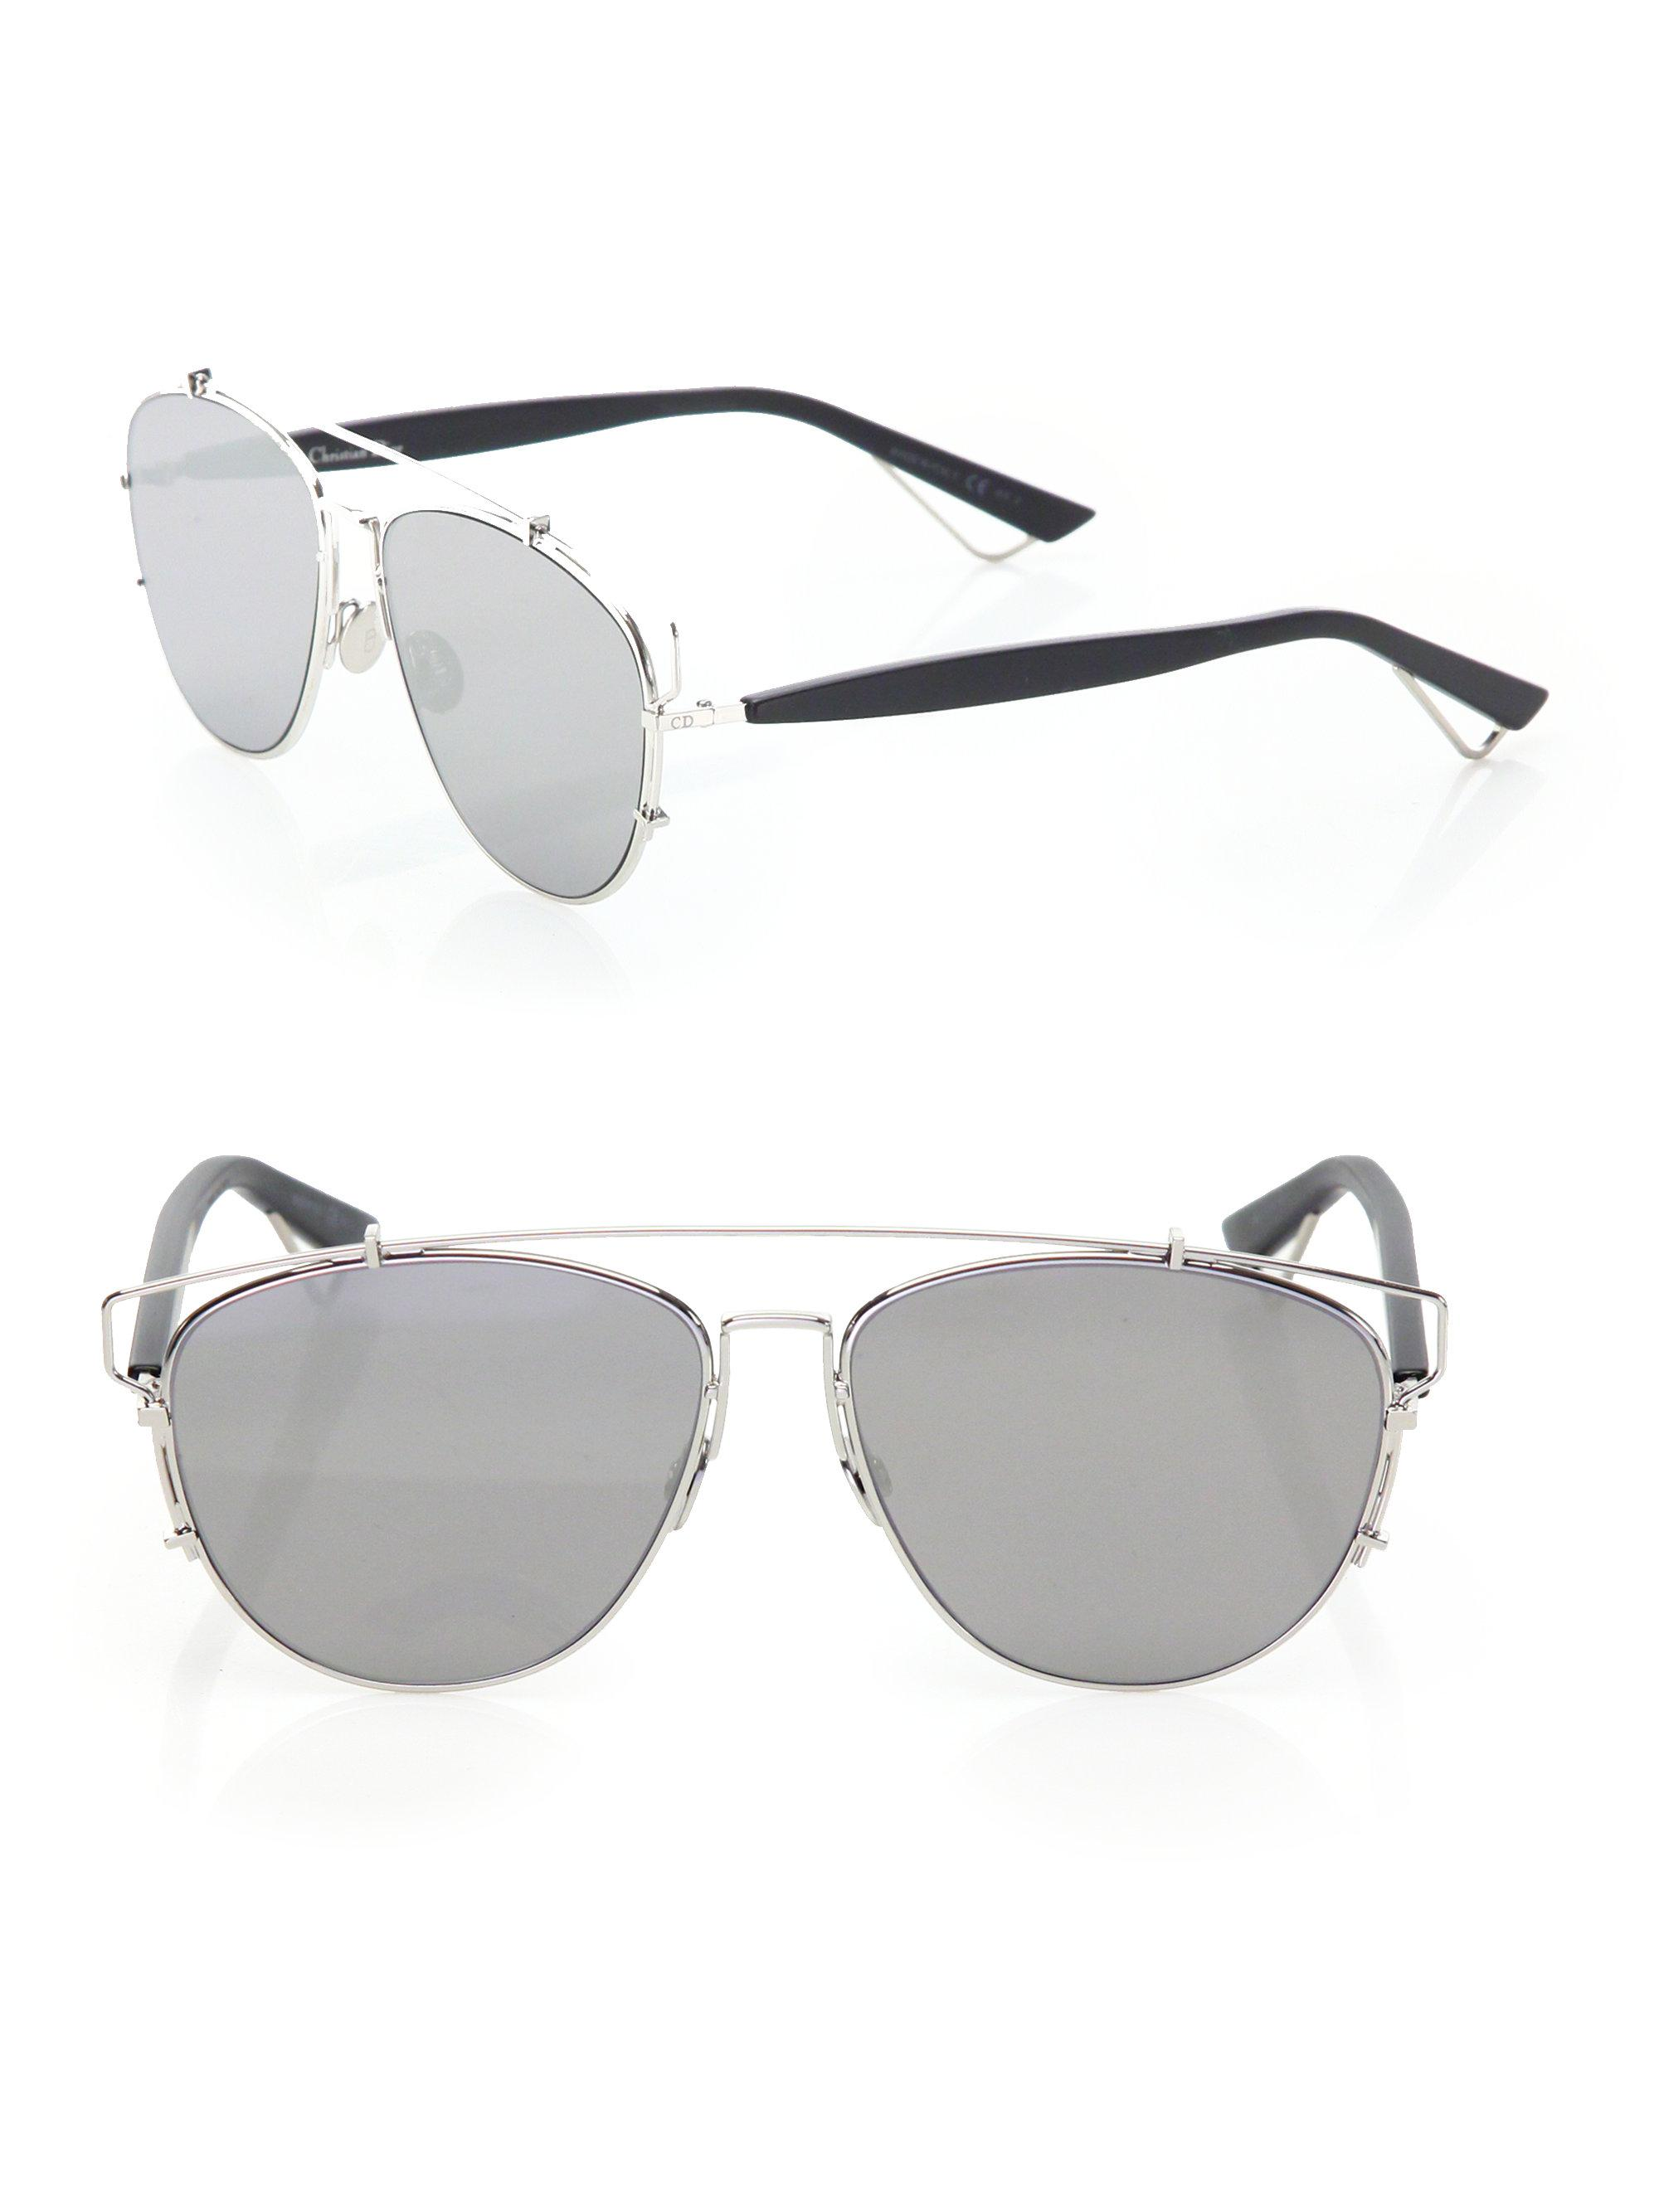 Lyst - Dior Technologic 57mm Pantos Sunglasses in Metallic 518e38ddb433